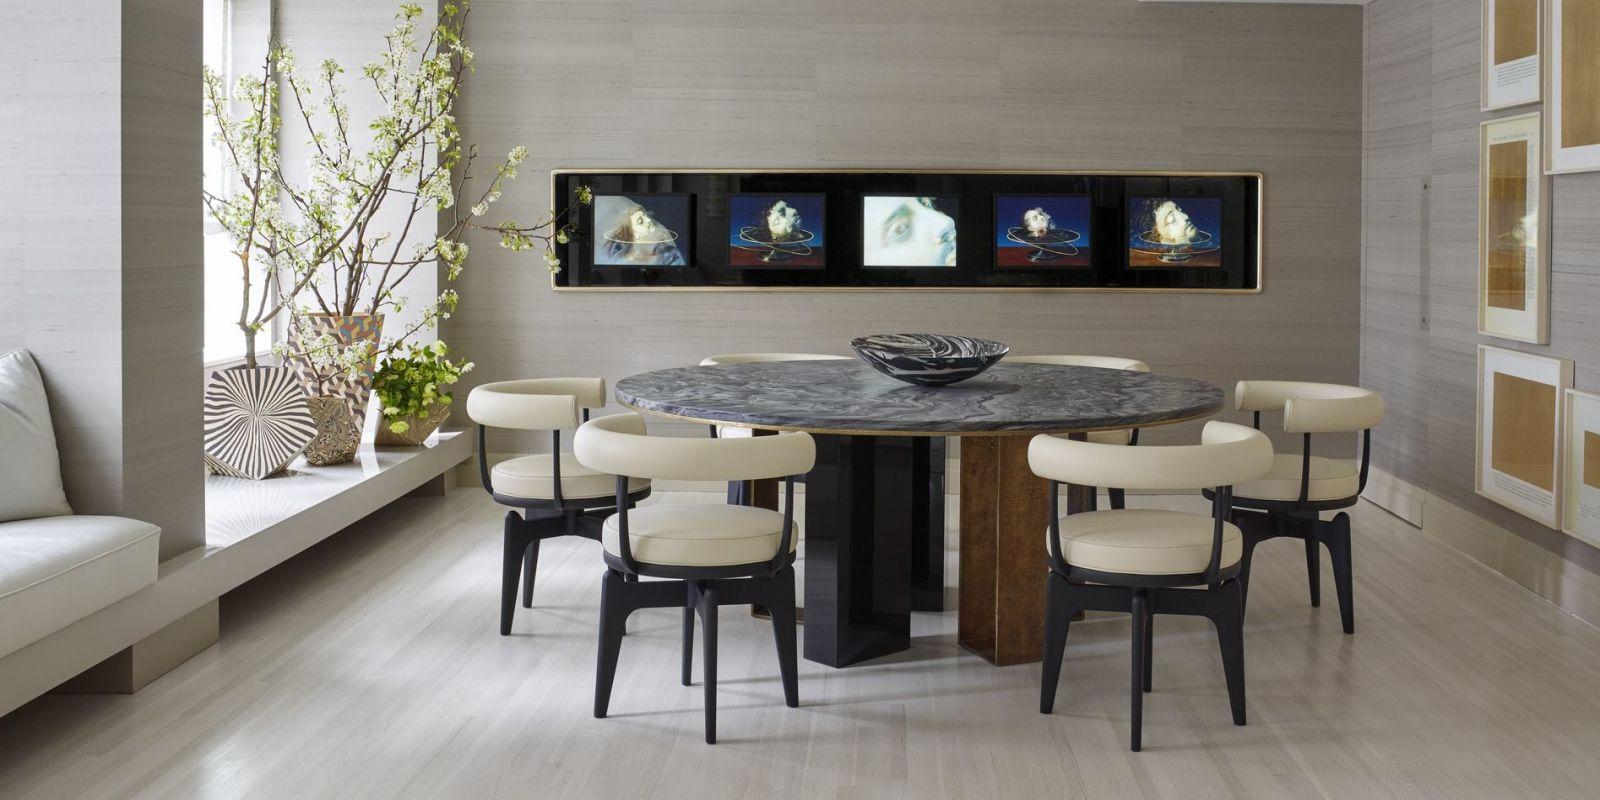 Dining Room Decor Contemporary